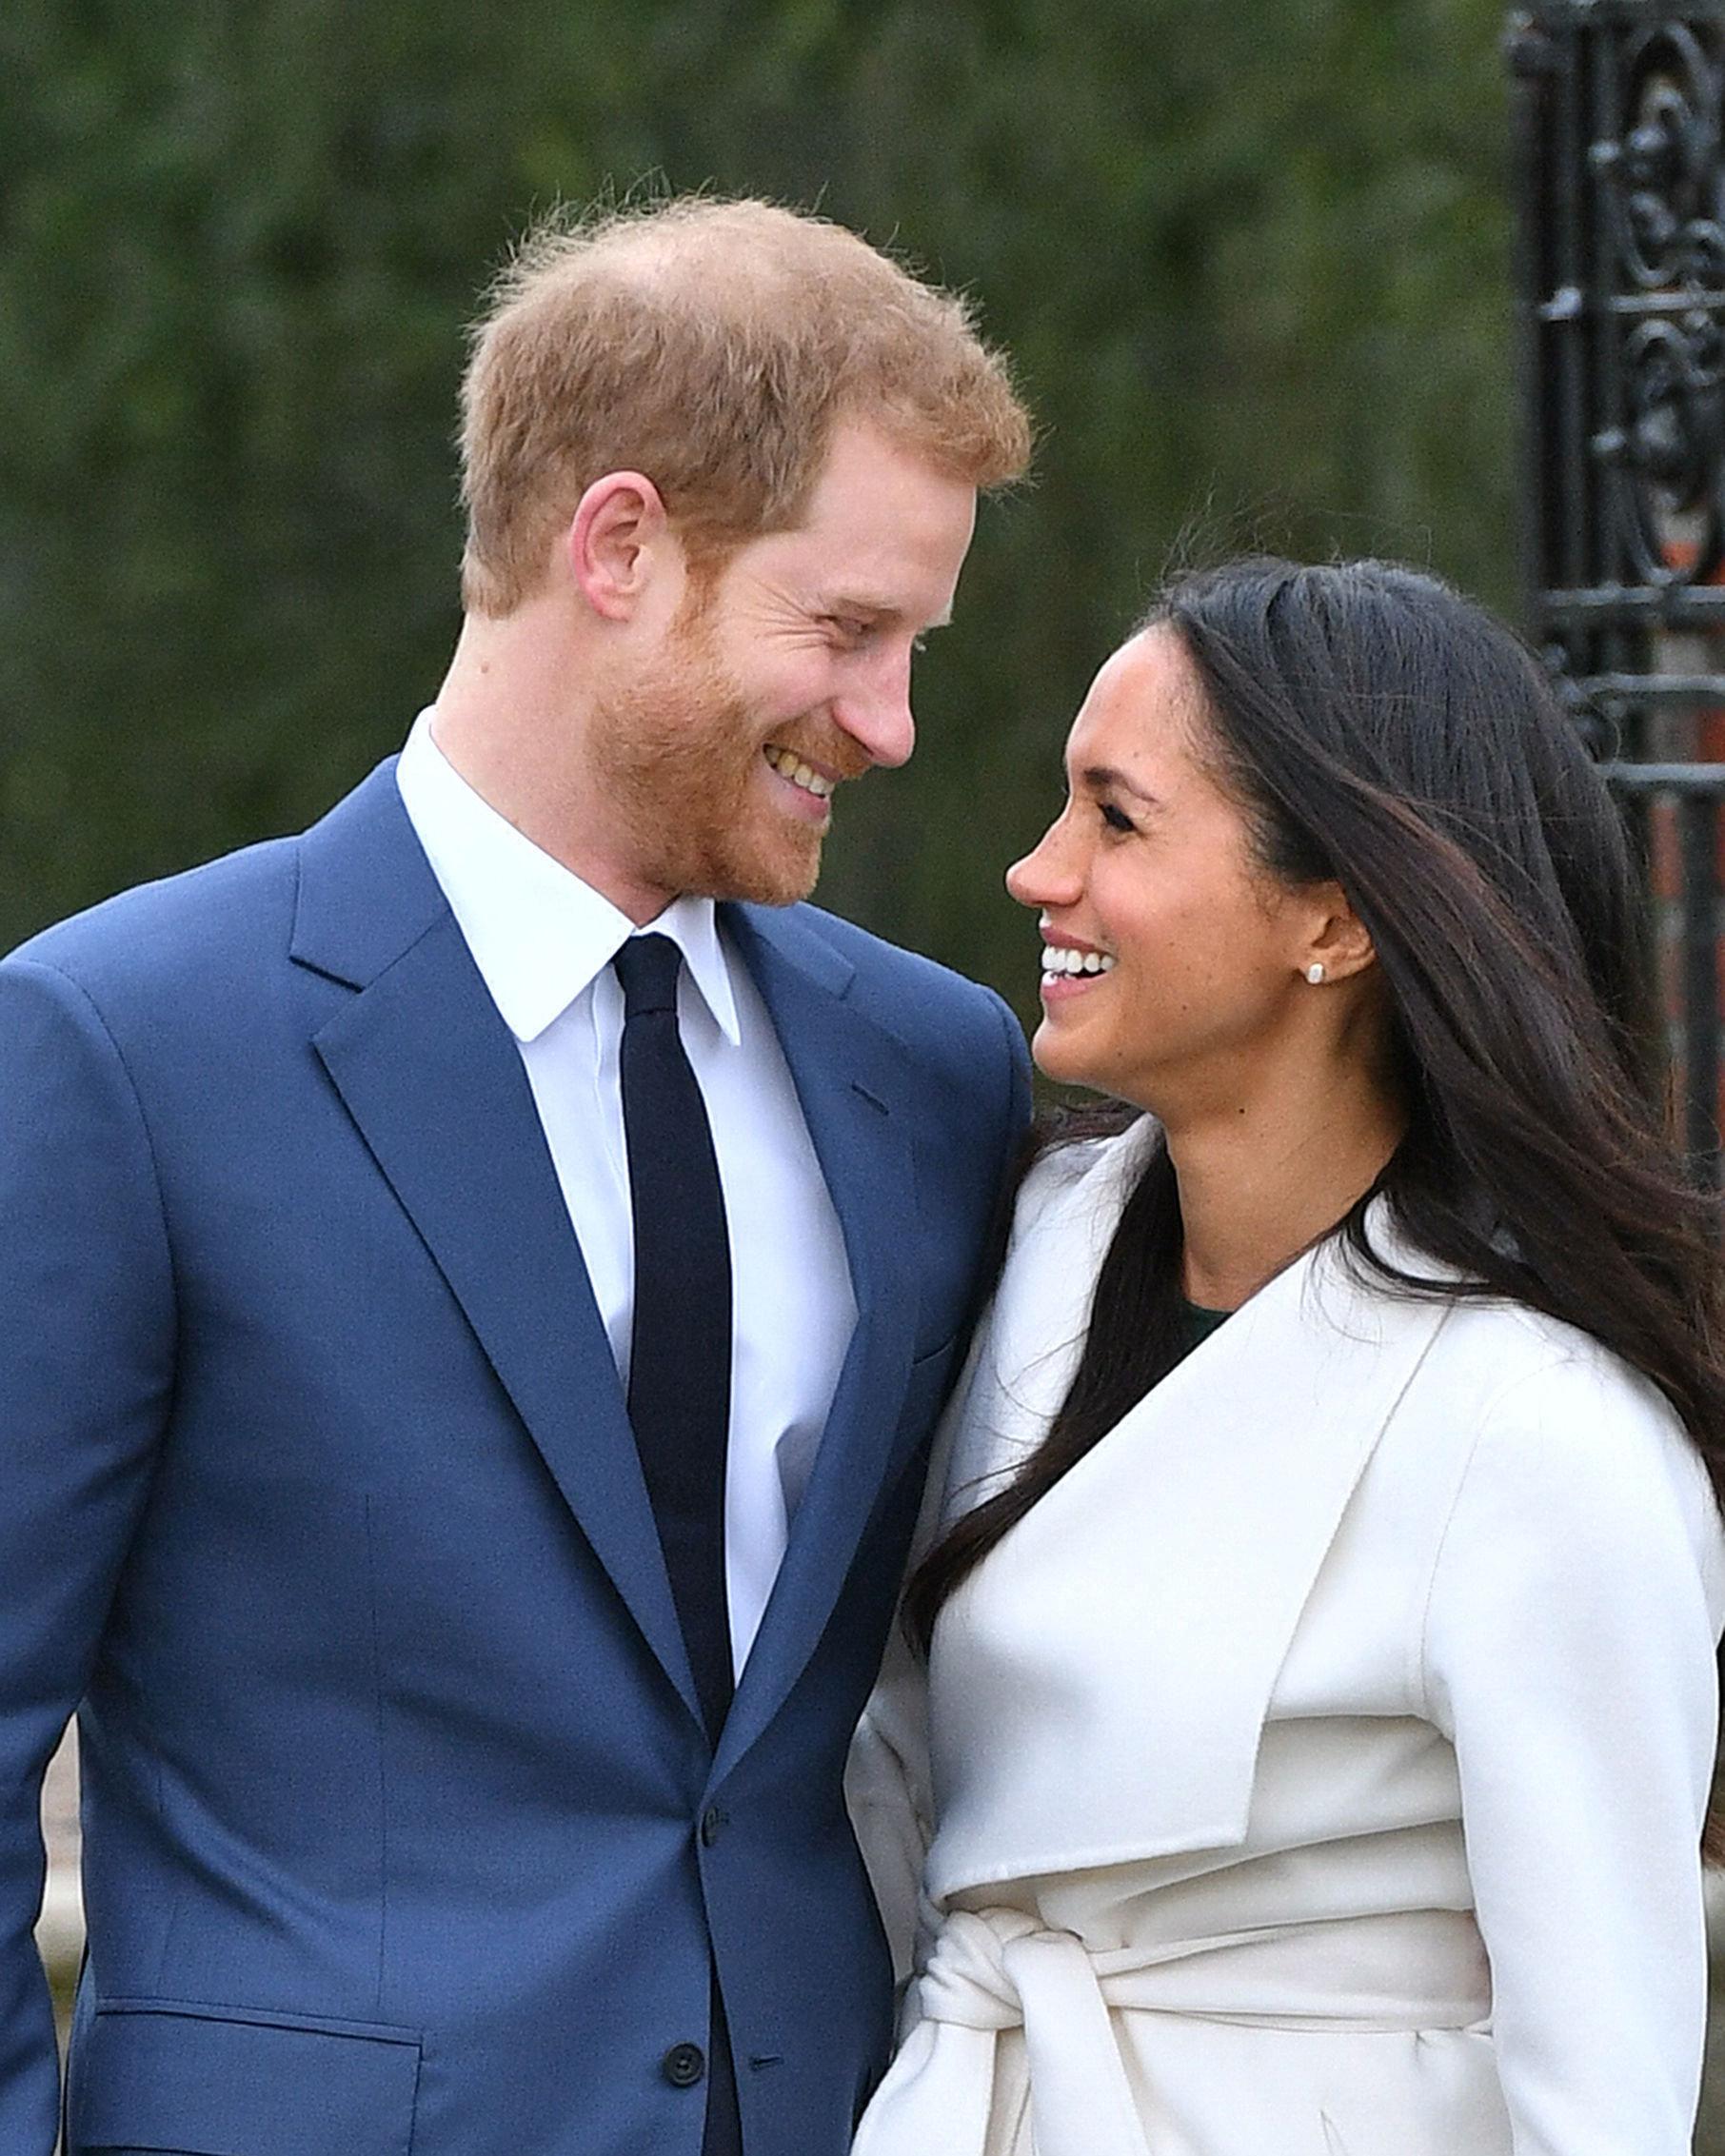 Prince Harry and Meghan Markle in the Sunken Garden at Kensington